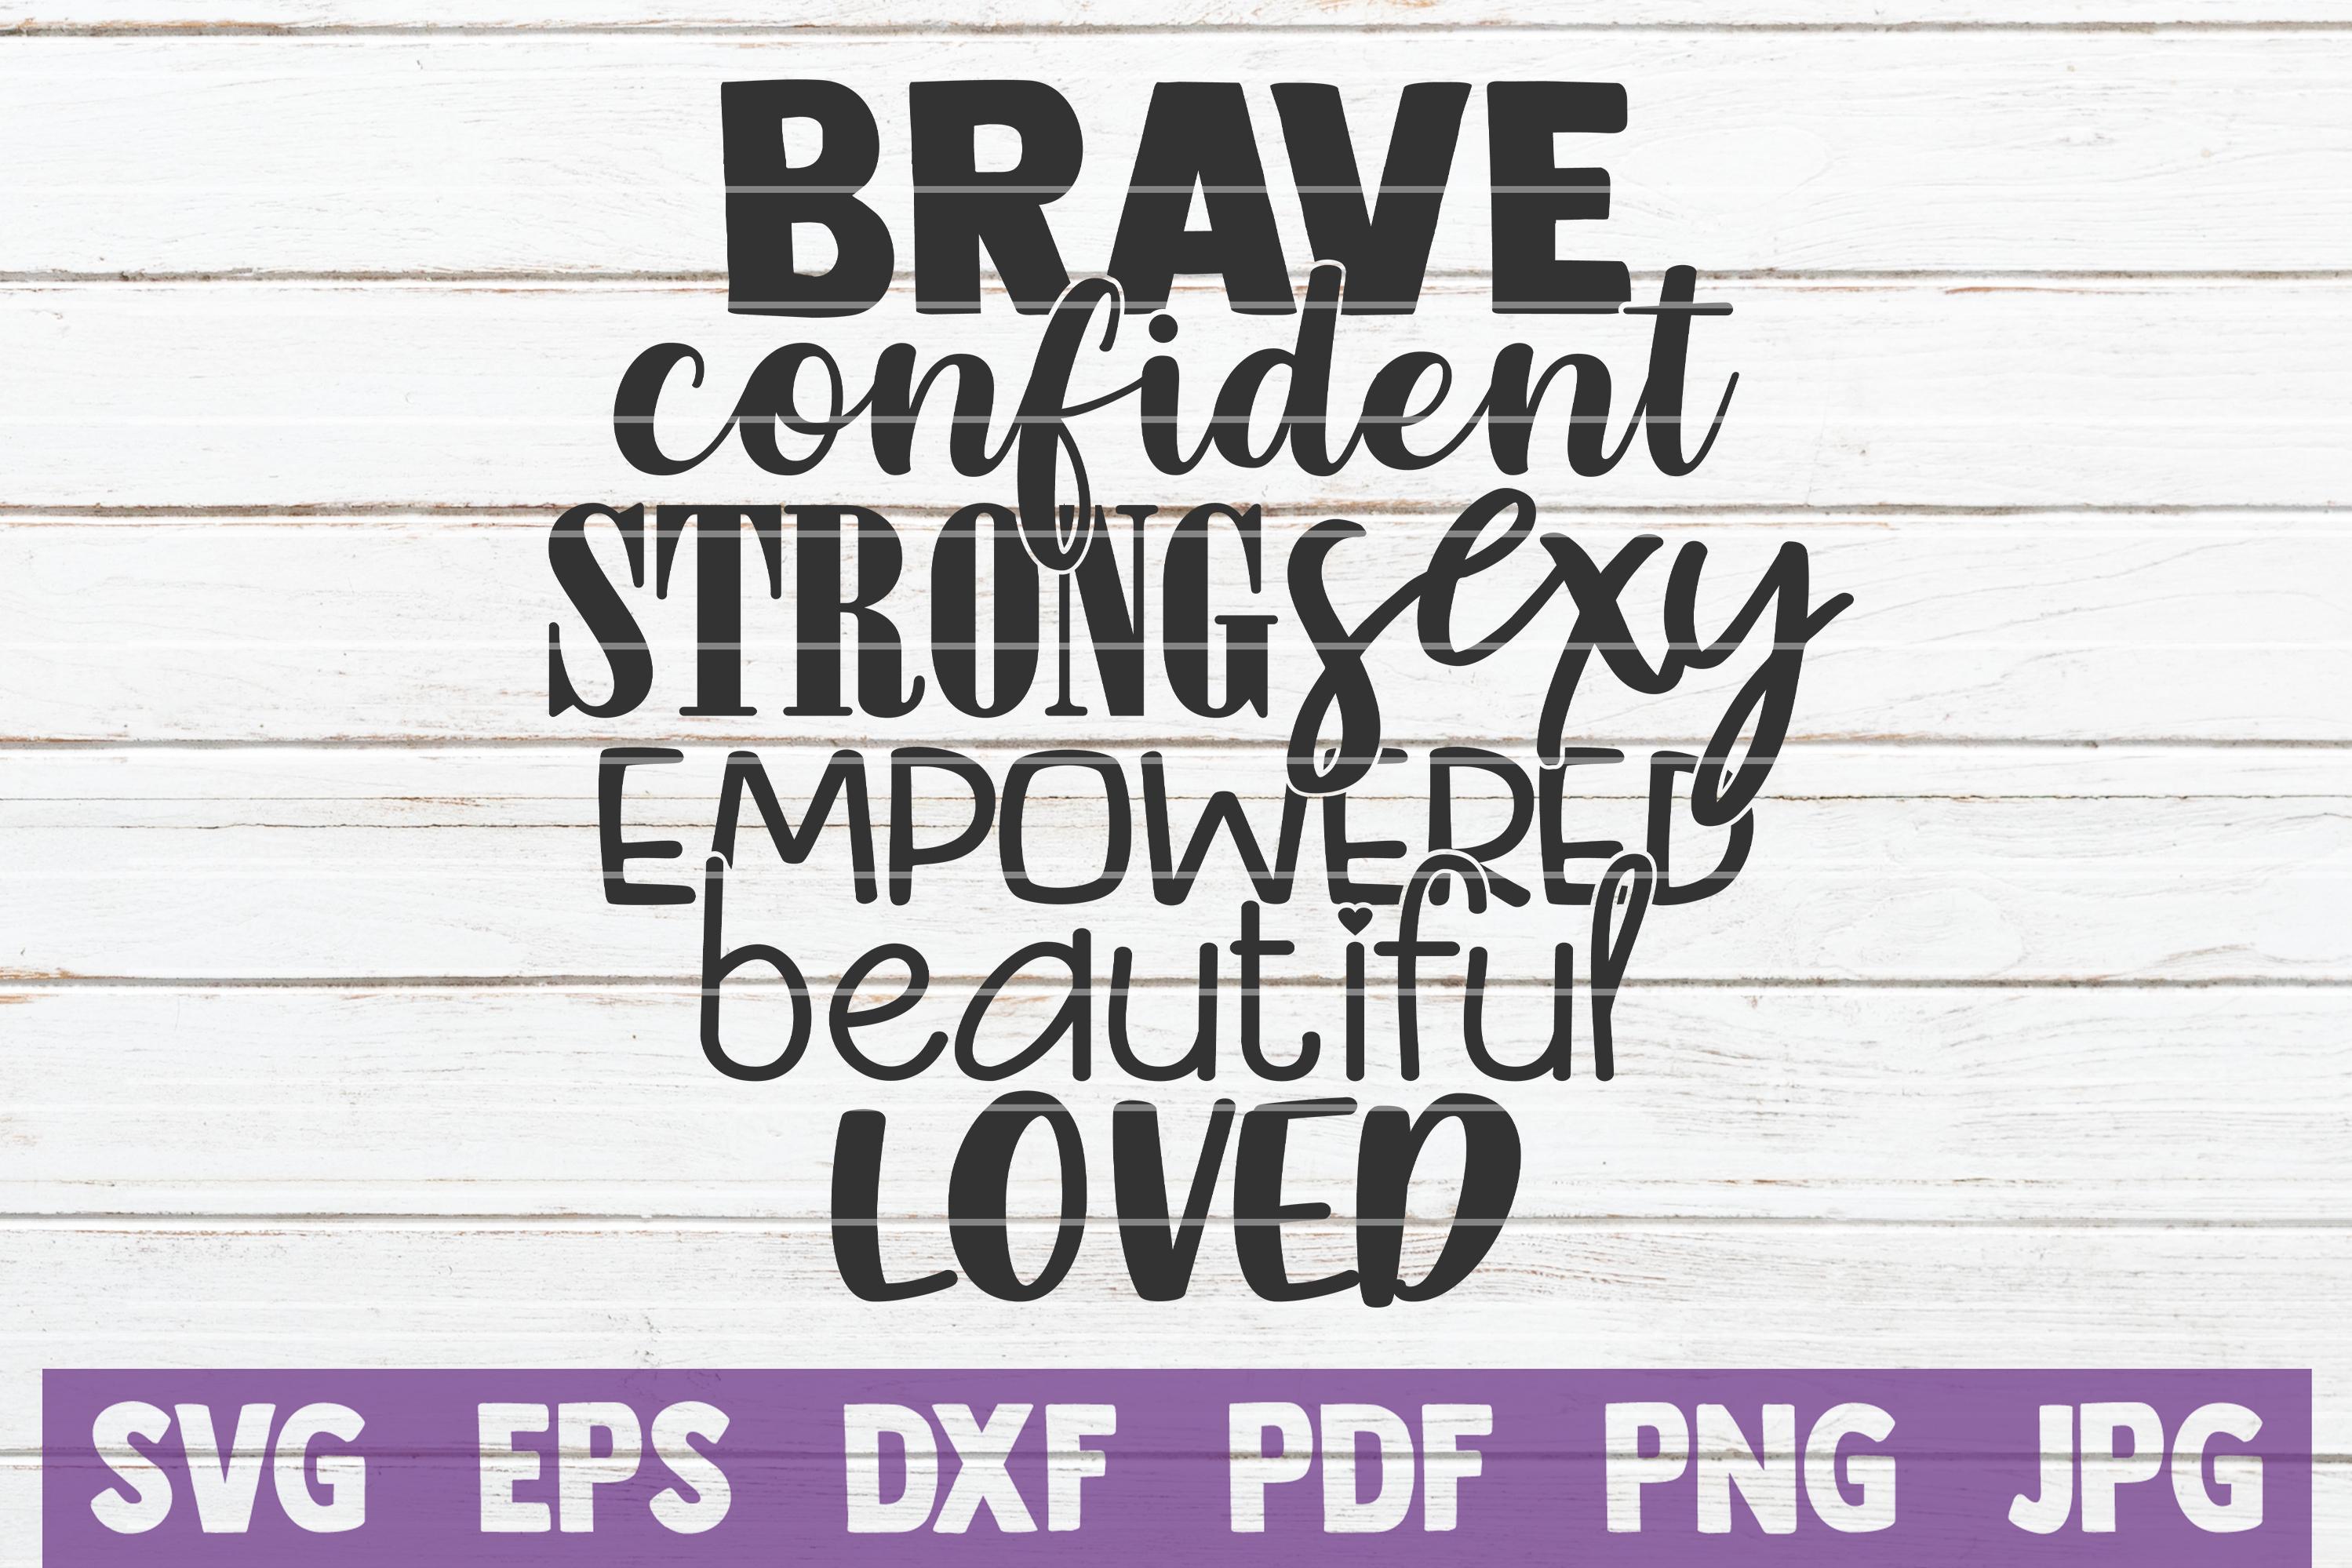 Girl power SVG Bundle | Woman Up SVG Cut Files example image 3